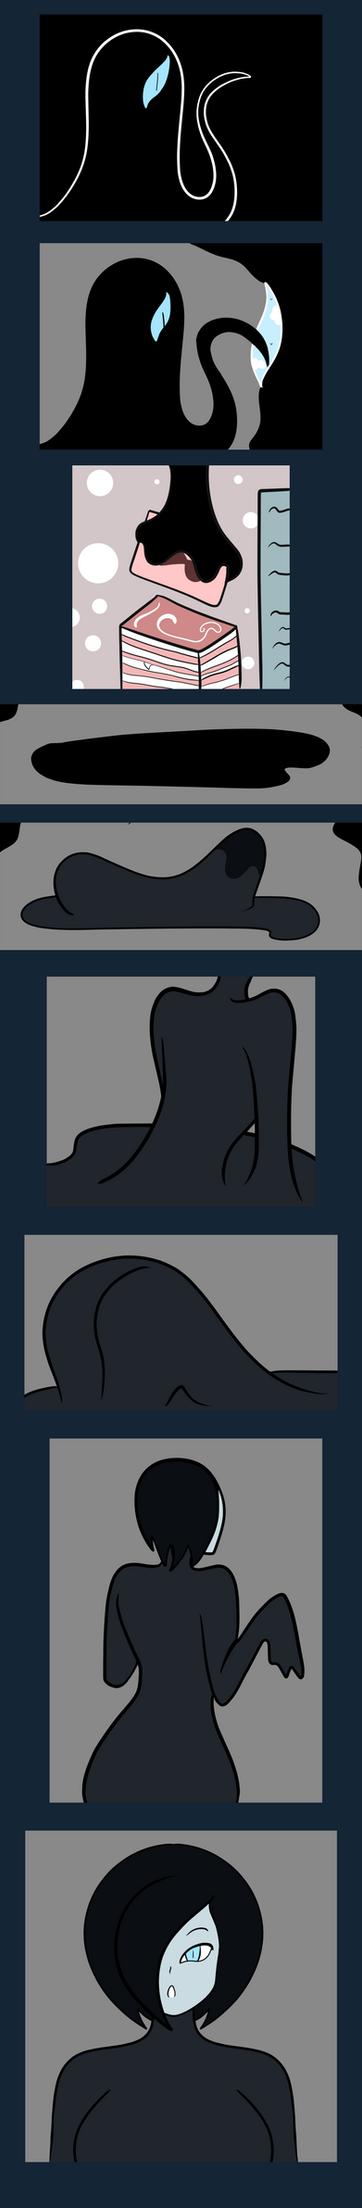 Umbra's Origins Part 2 by DB-Palette